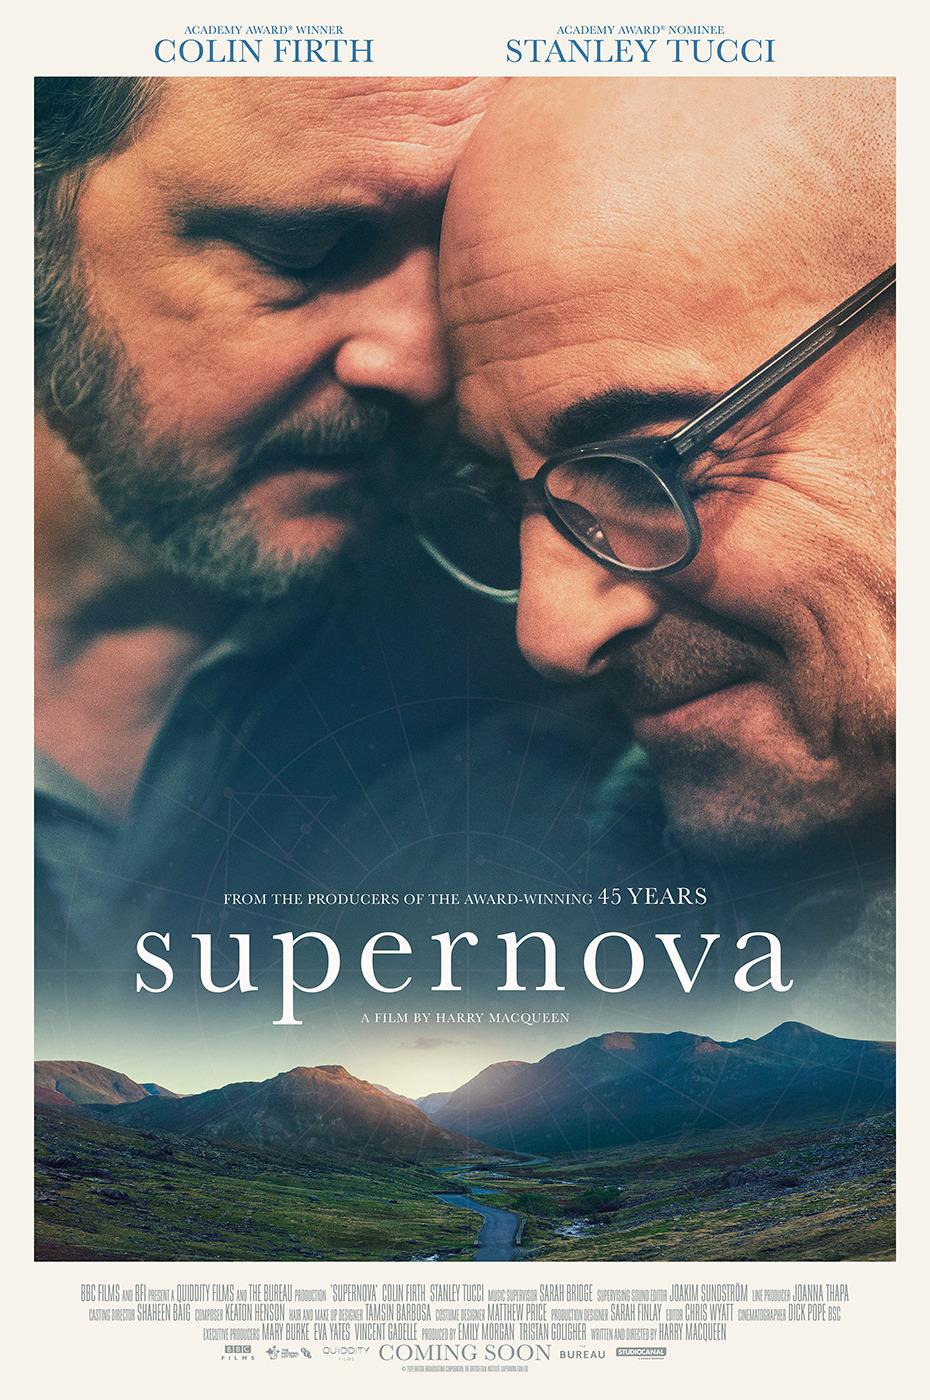 Summer of Cinema: Supernova